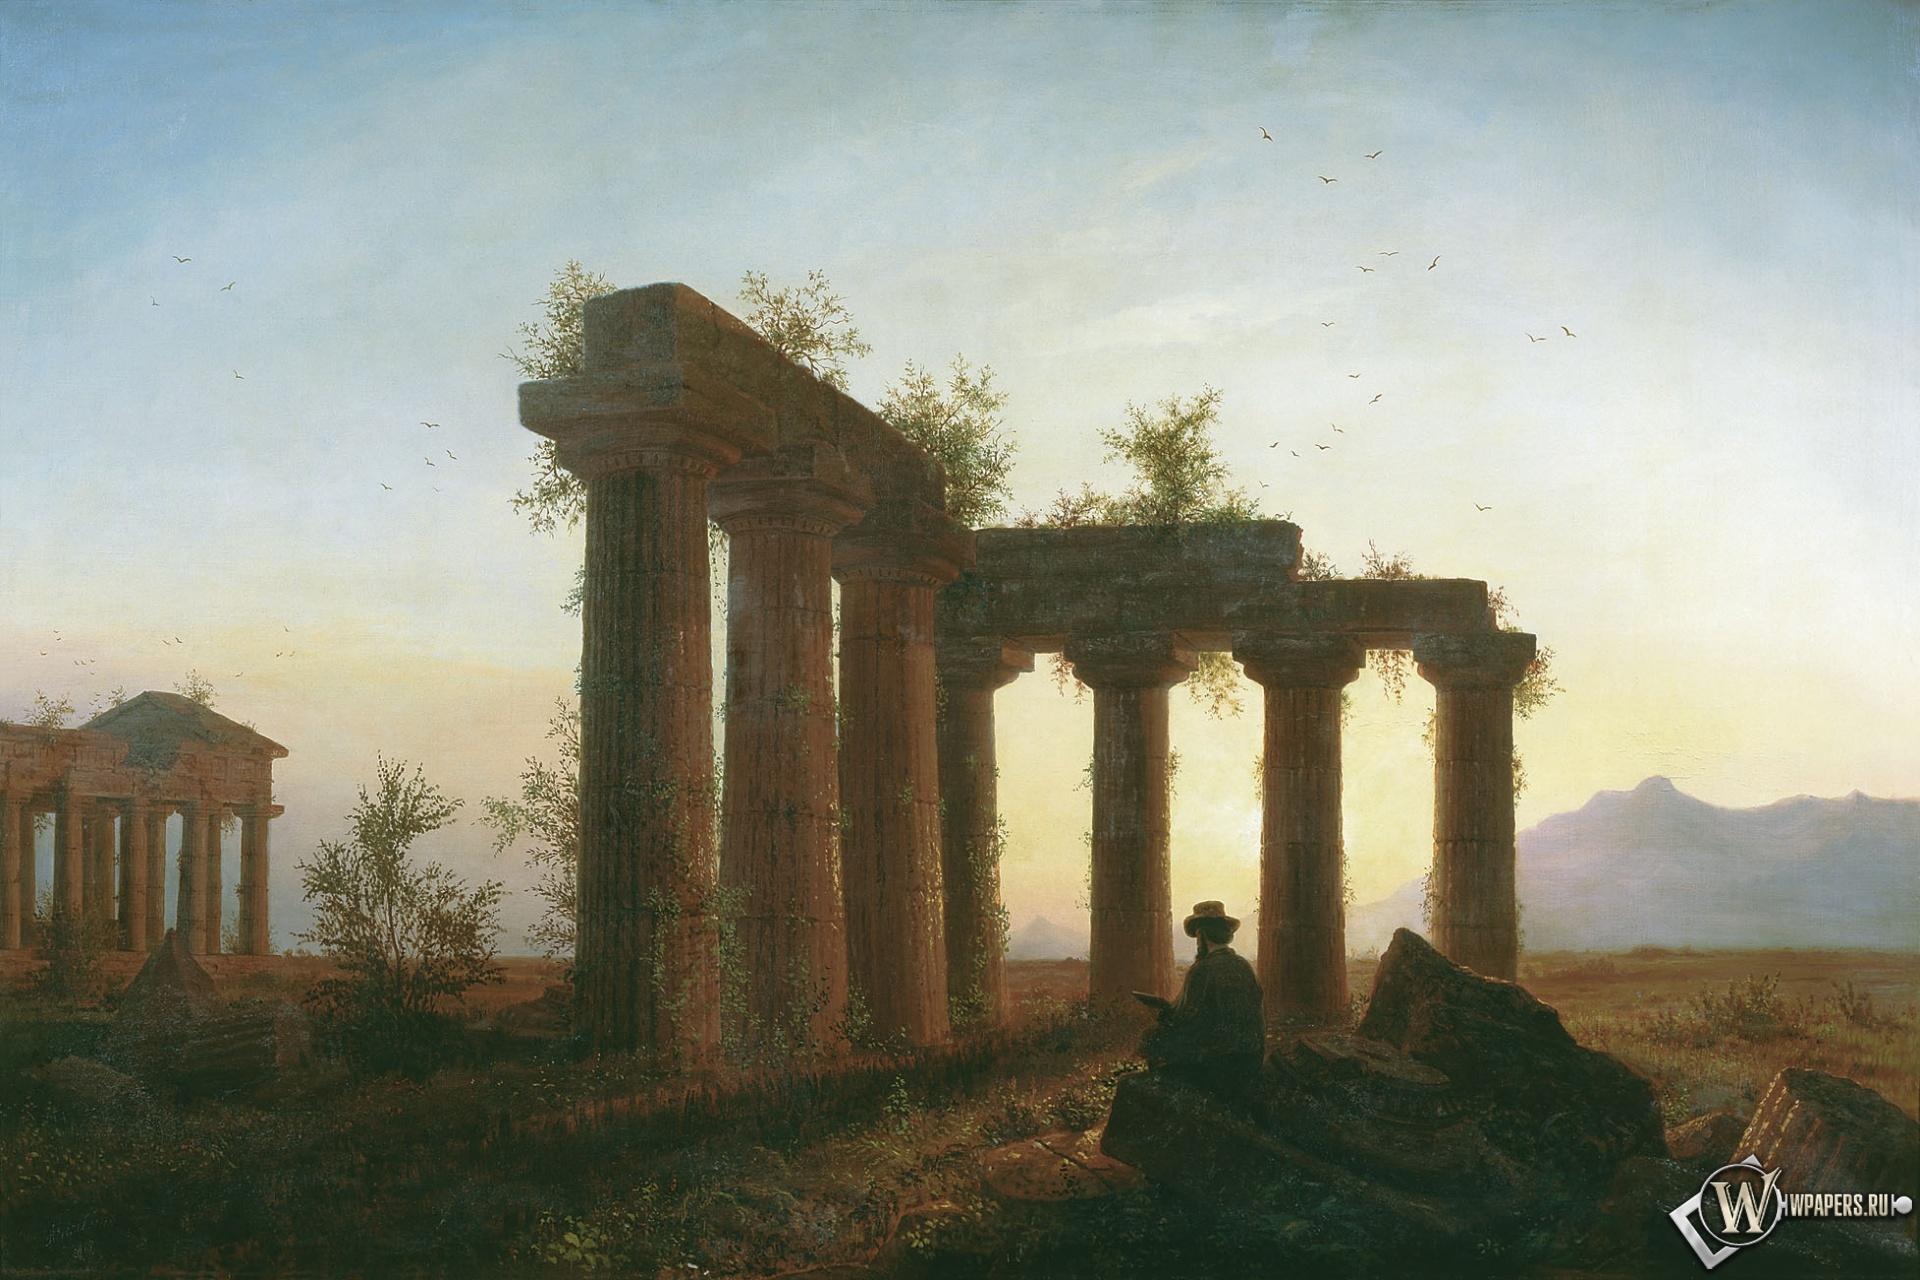 Развалины греческого храма 1920x1280